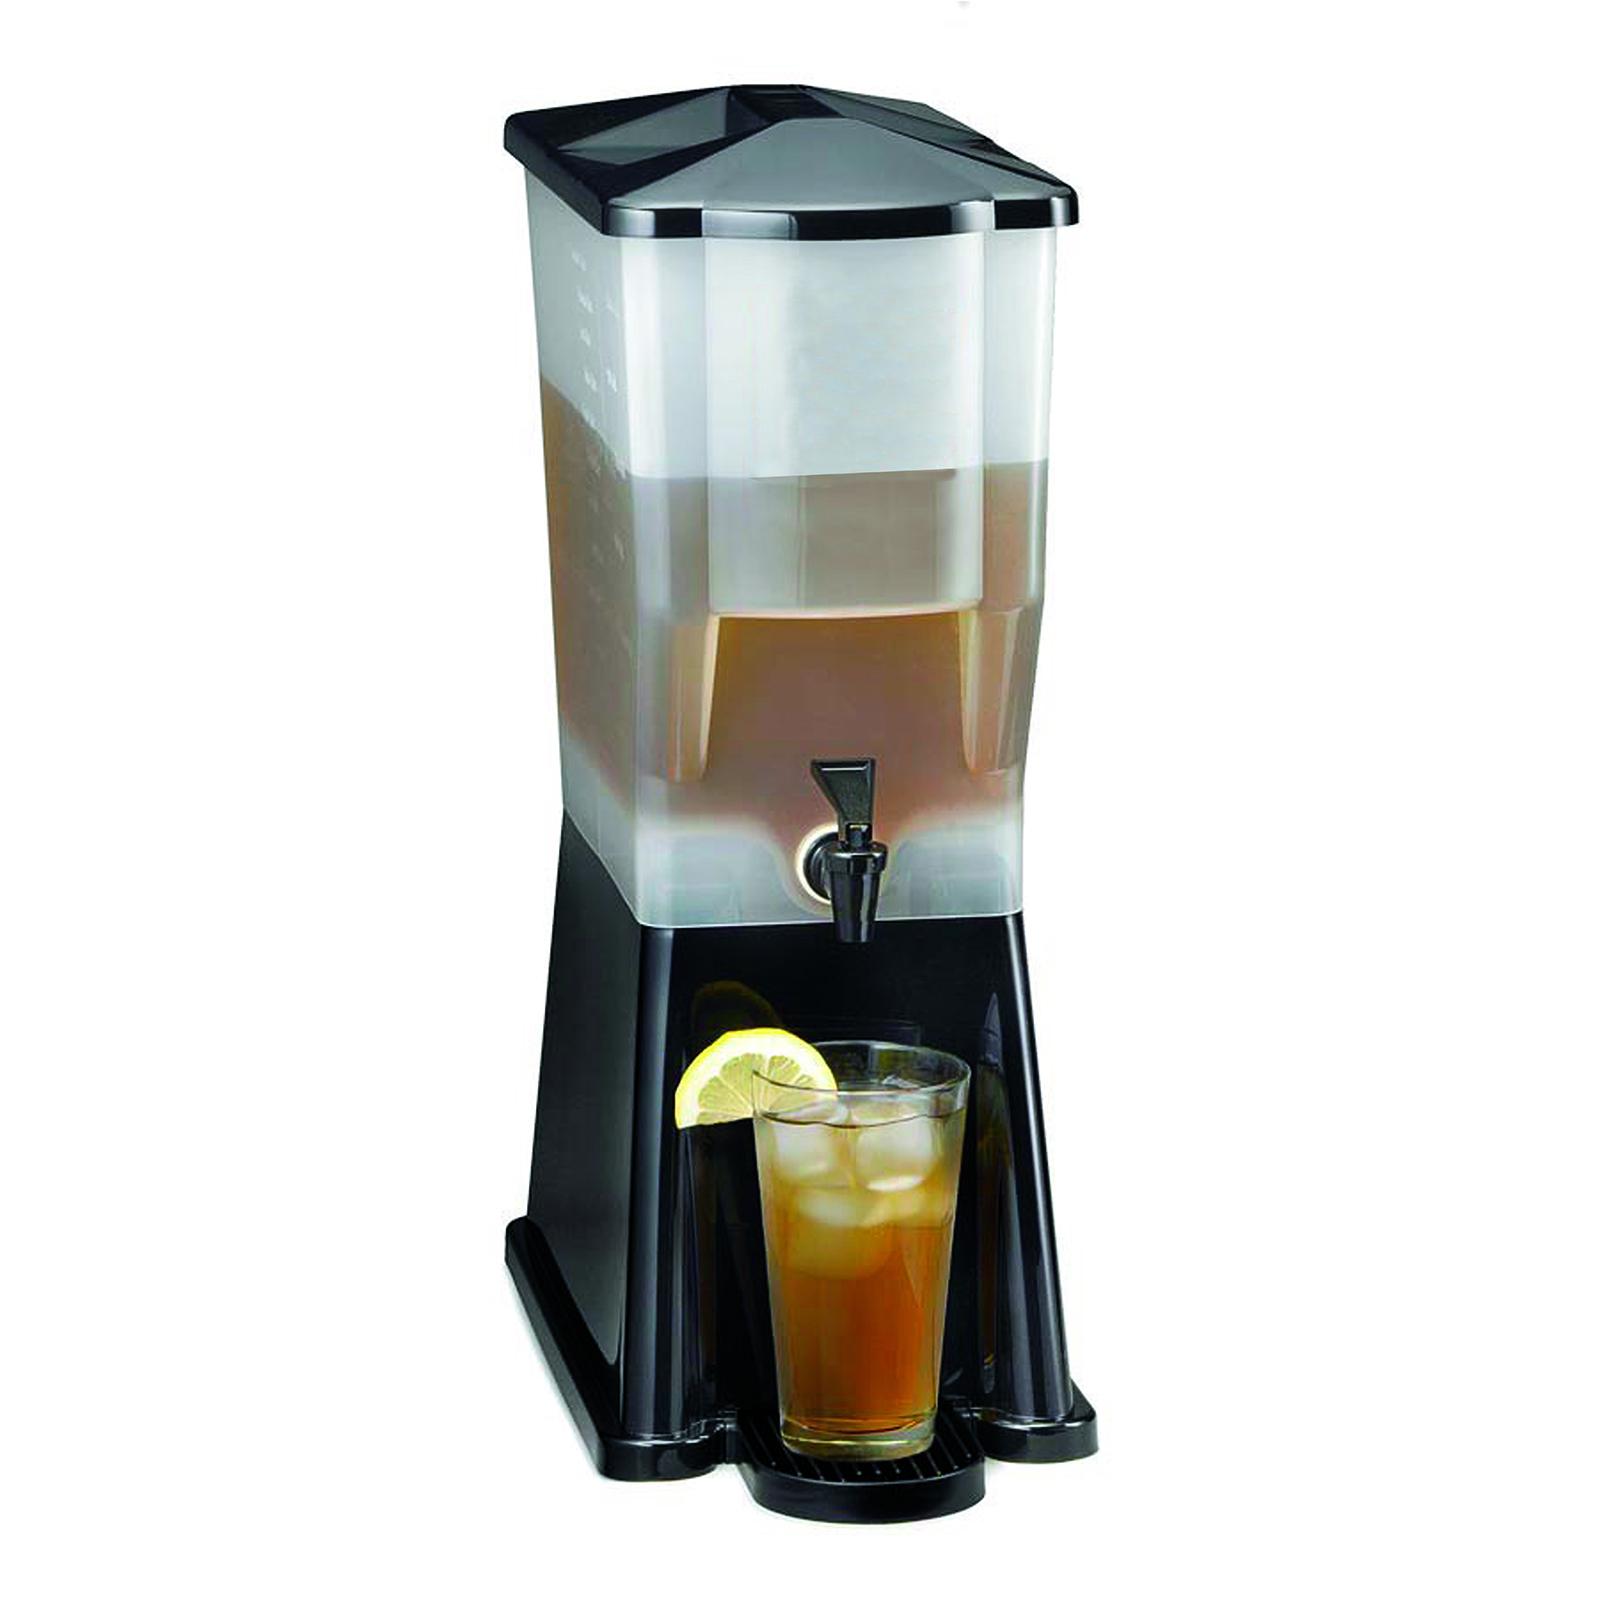 TableCraft Products 353B beverage dispenser, stand